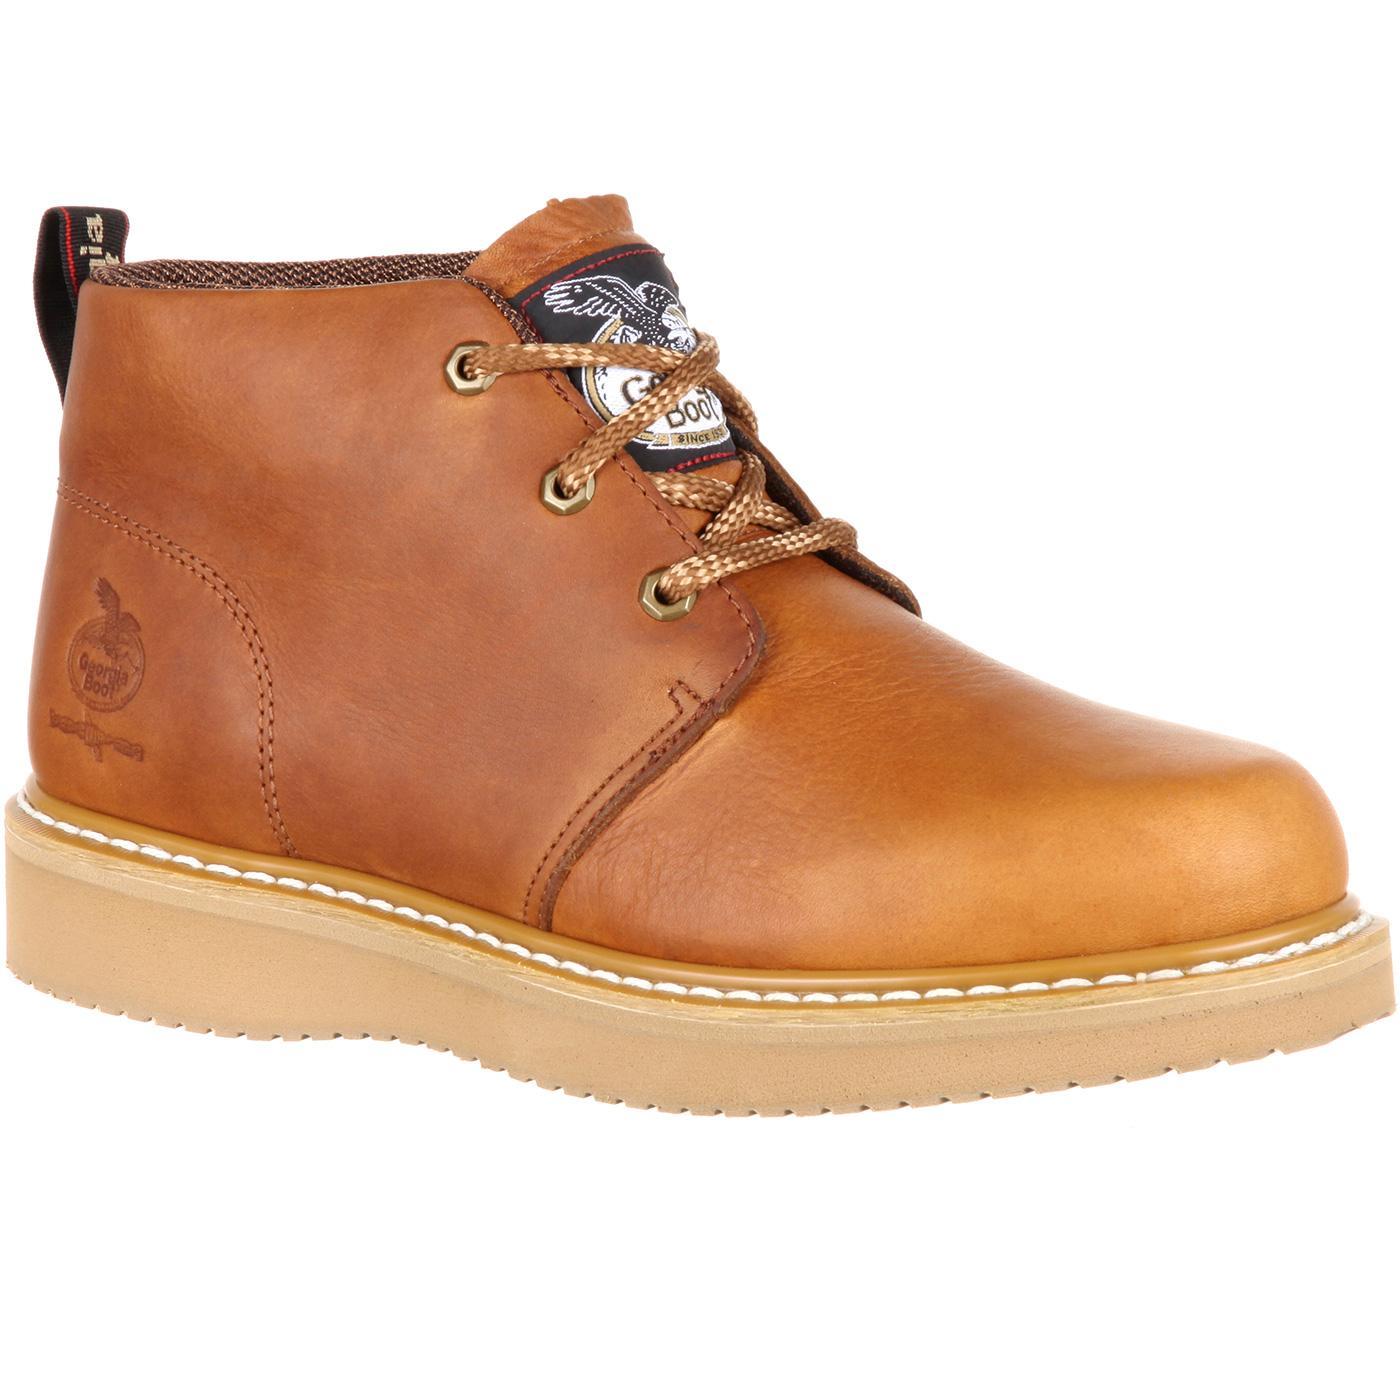 3e9fa02f0c6 Georgia Boot Wedge Chukka Composite Toe Work Boot